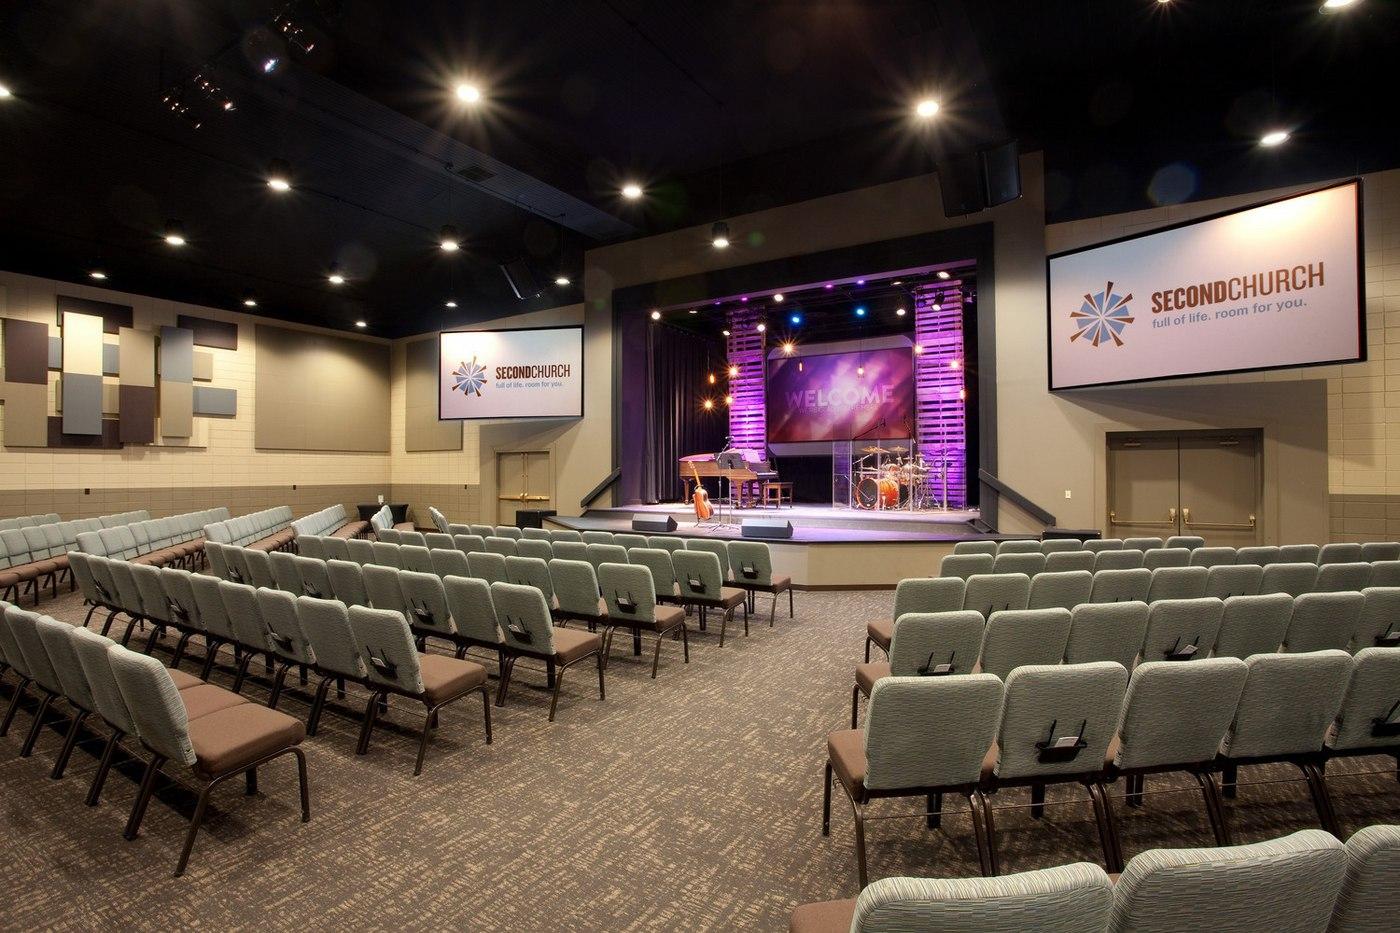 Second_Church_Auditorium_01.jpg